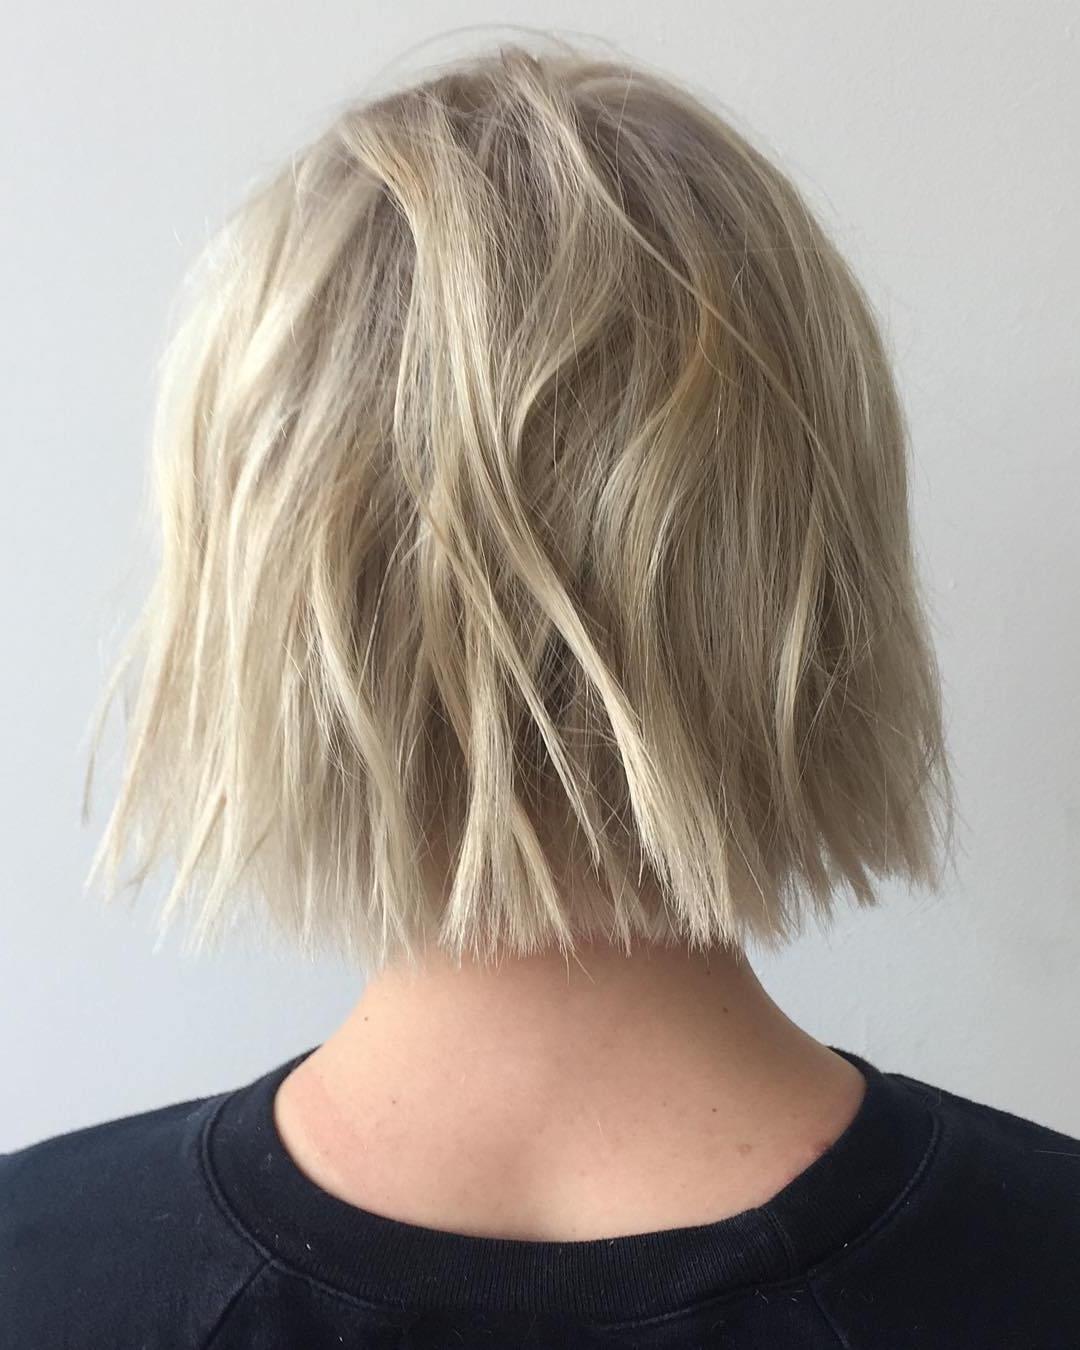 50 Choppy Bobs Too Damn Good Not To Copy – Hair Adviser Regarding Voluminous Short Choppy Blonde Bob Hairstyles (View 5 of 20)